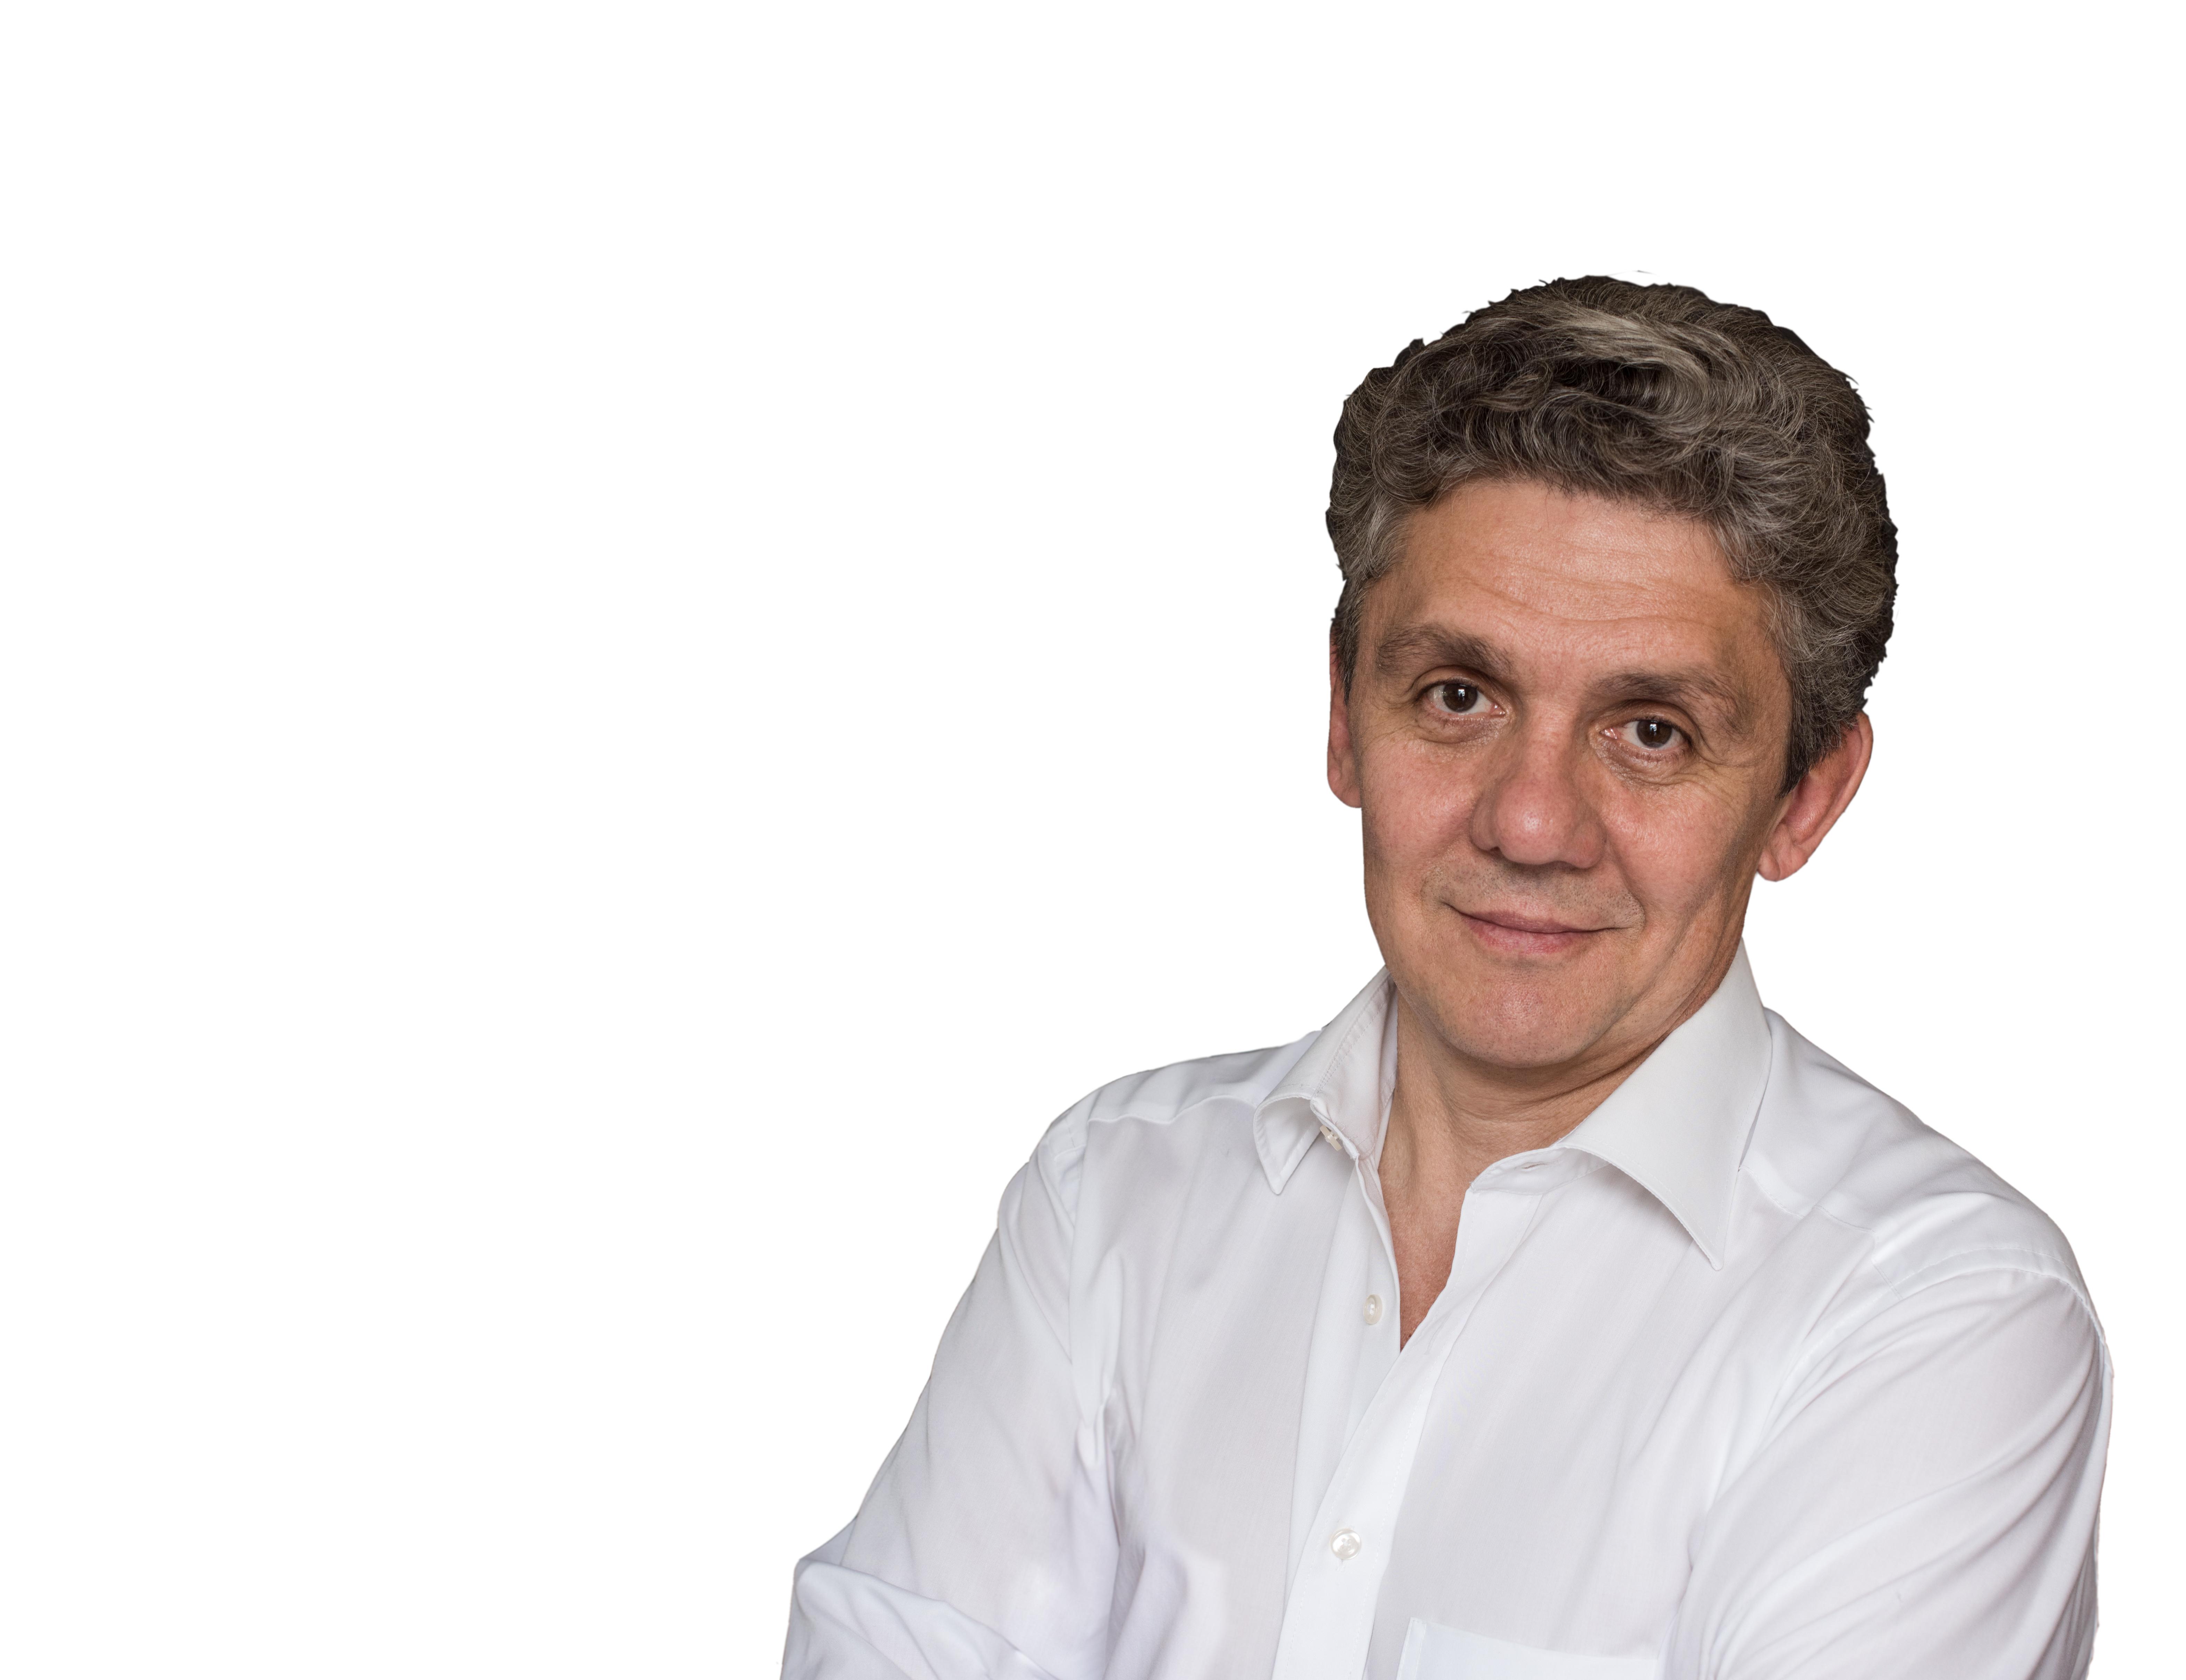 Dimitri Kandidov